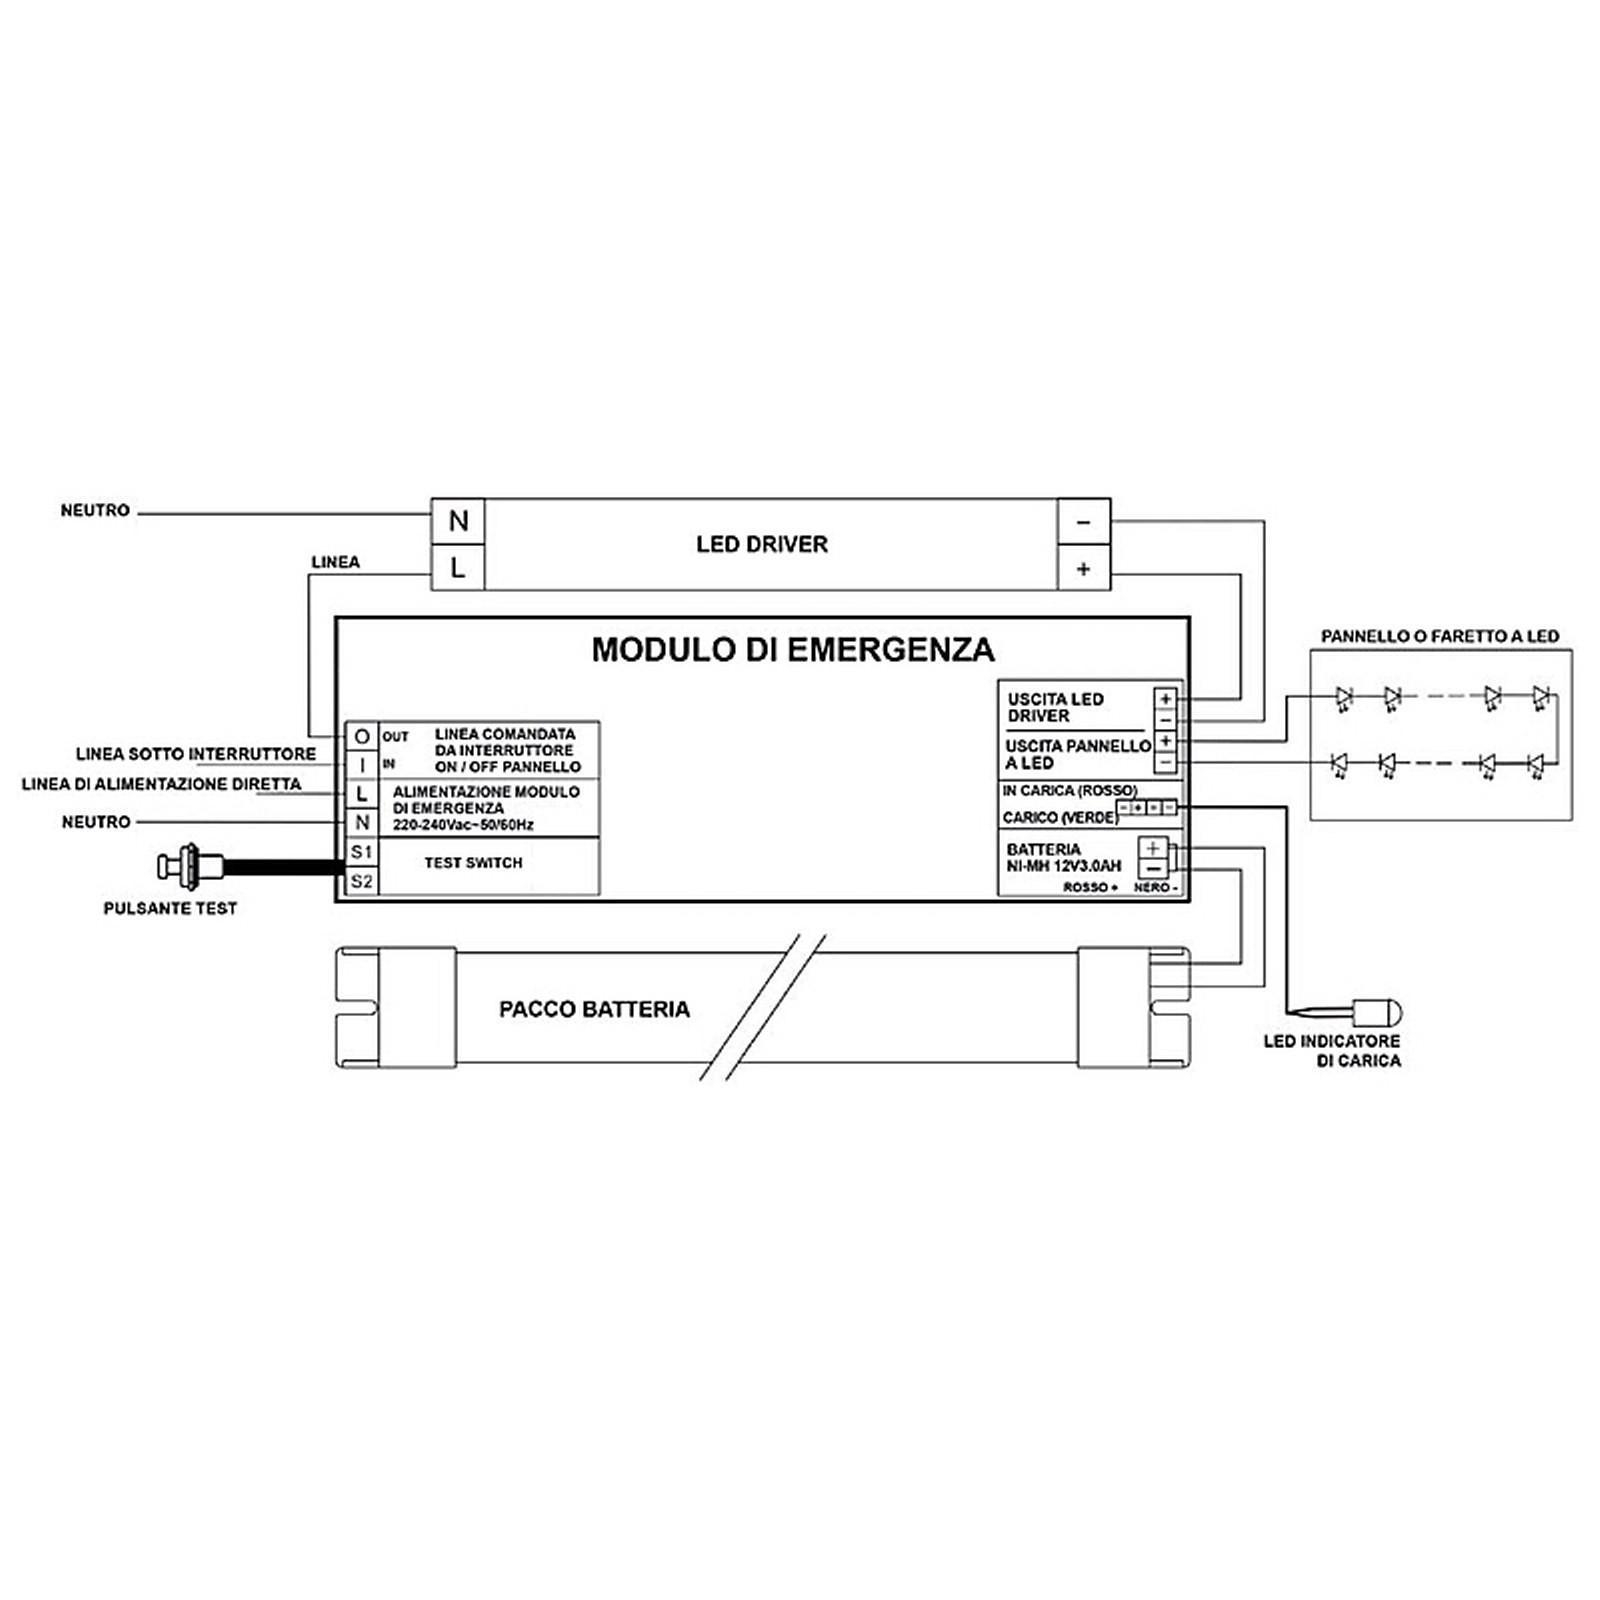 Schema Elettrico Lampada Di Emergenza Beghelli : Kit di conversione batteria luci emergenza per faretto